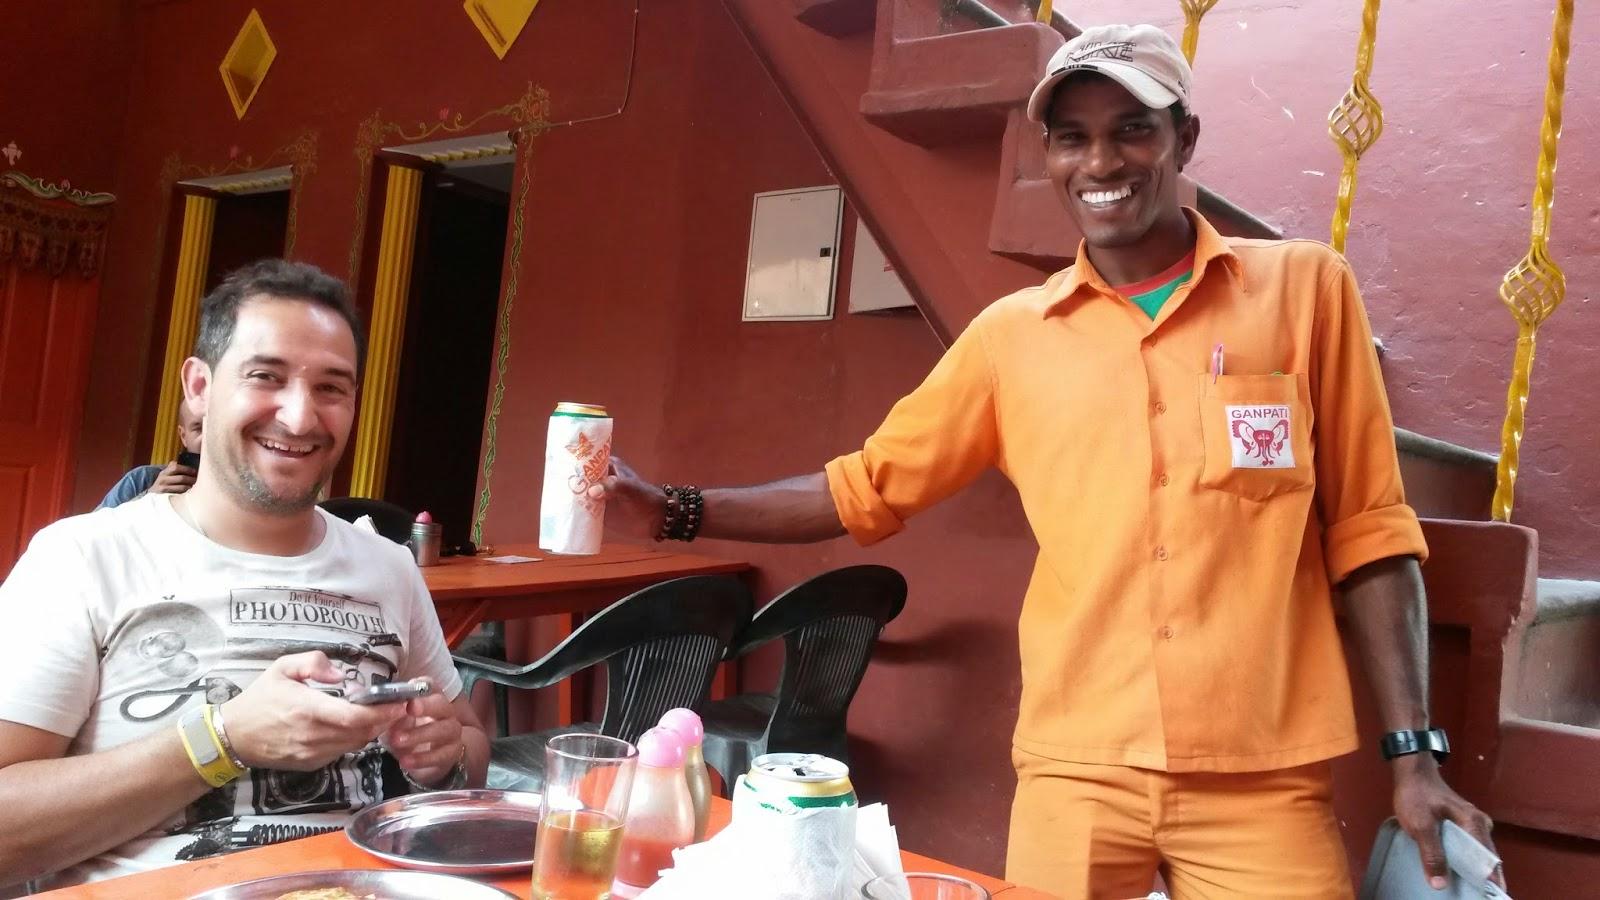 Viaje a India: hotel Ganpati restaurante en Varanasi (Benares)